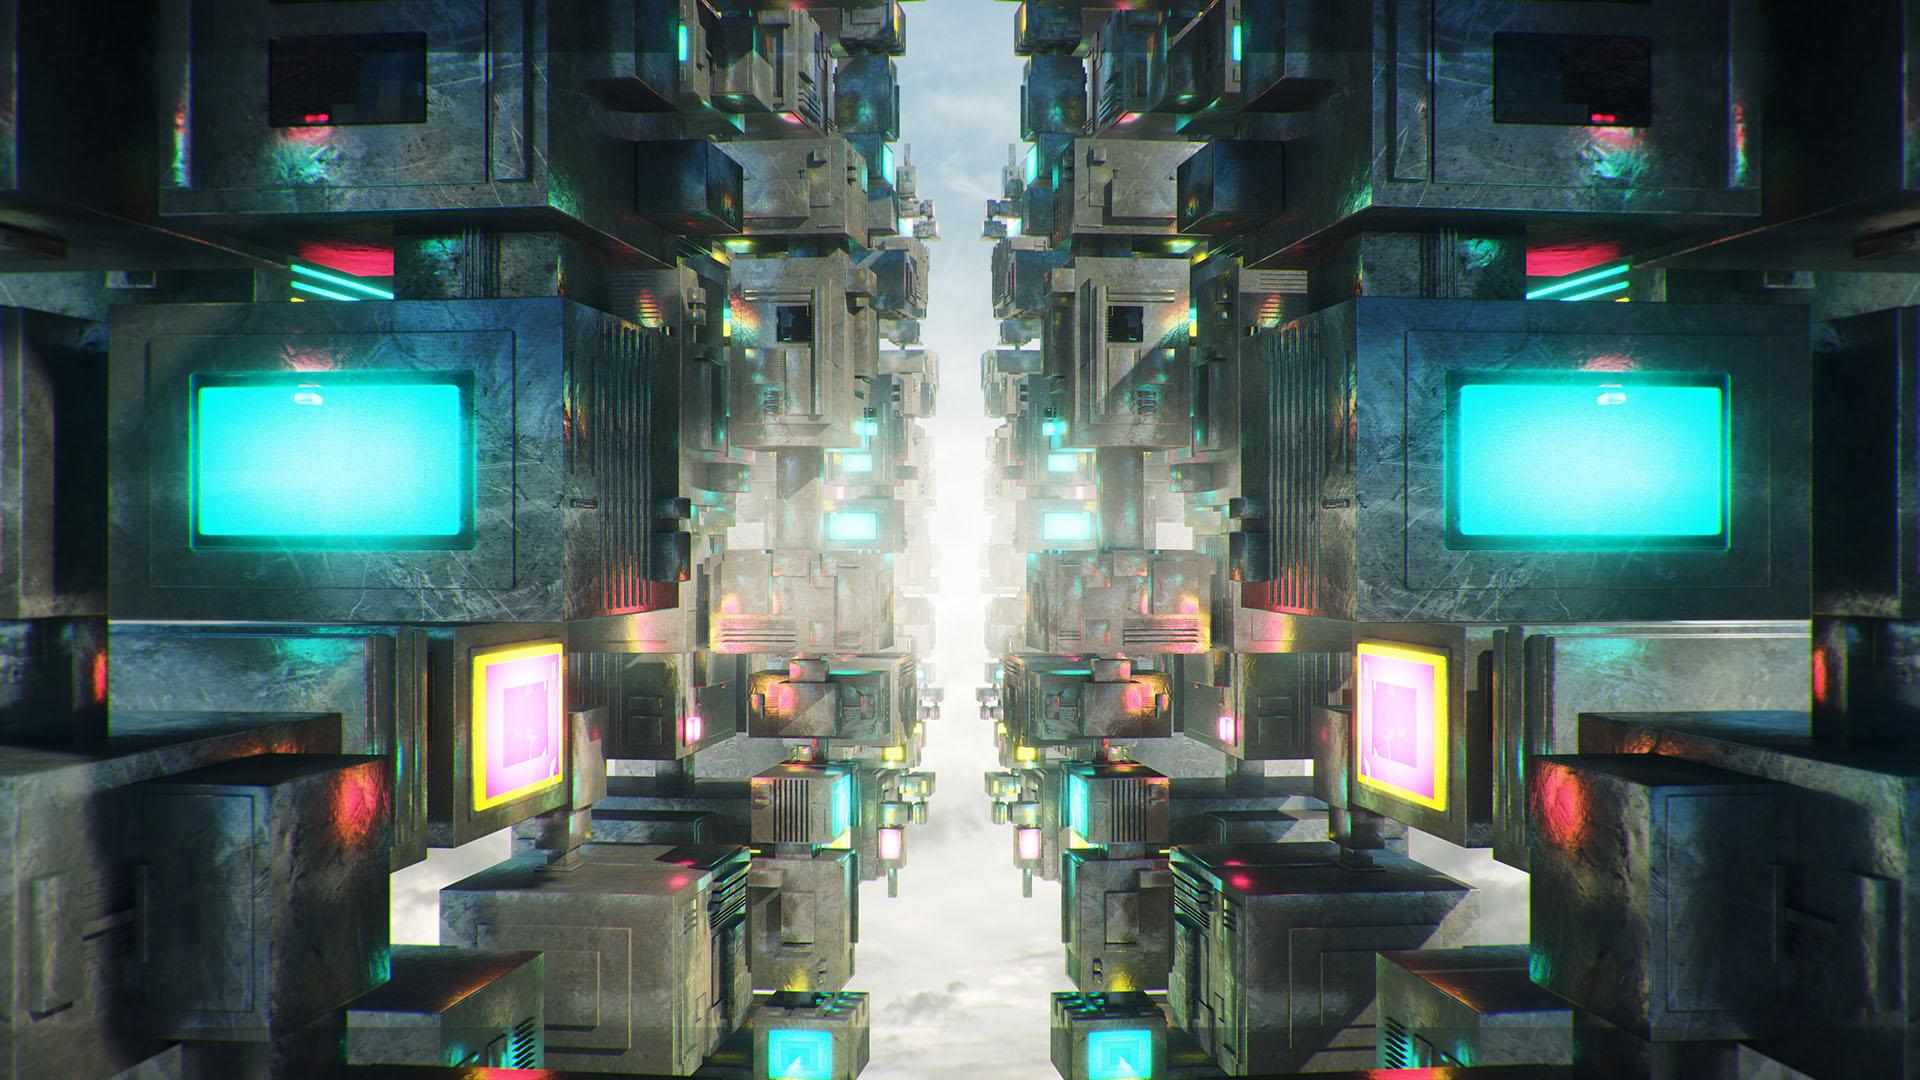 Cube City Ghosteam